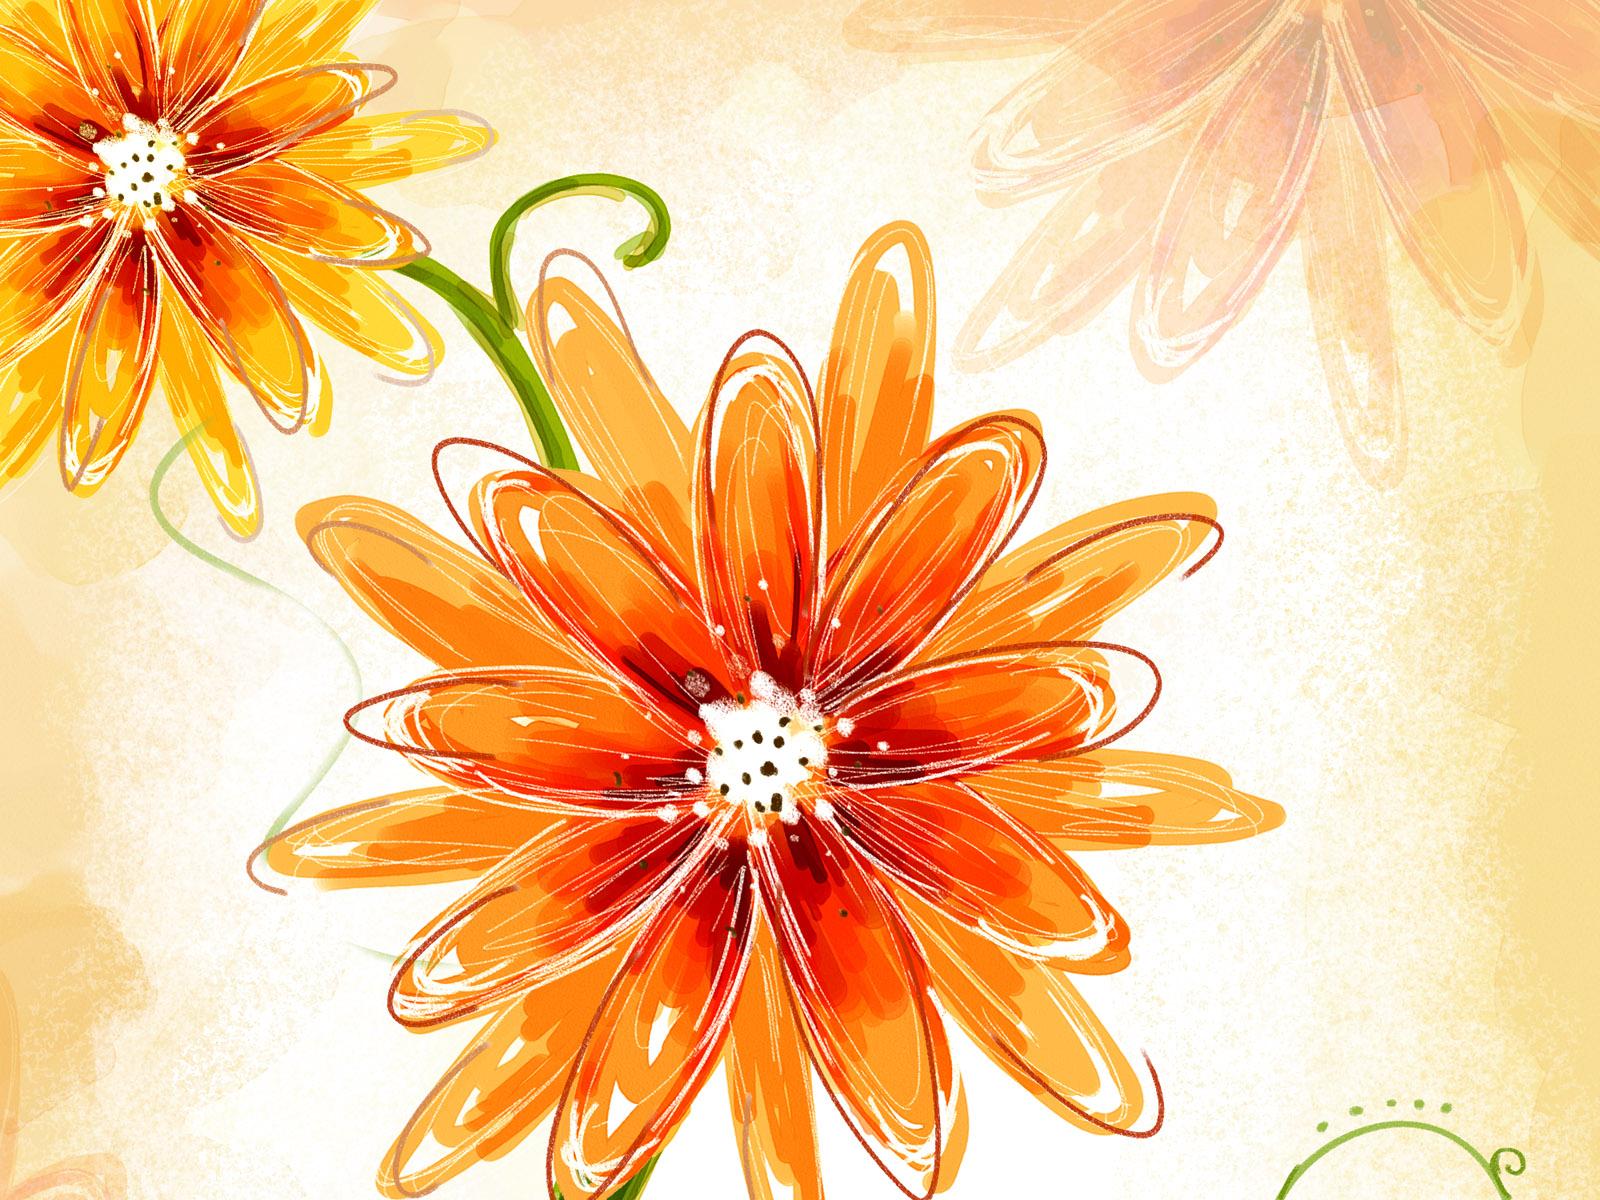 http://4.bp.blogspot.com/_hkv_lshfbXw/TGUUzhUCsqI/AAAAAAAABU8/-HNiSOlJ4wk/s1600/A5-2.jpg